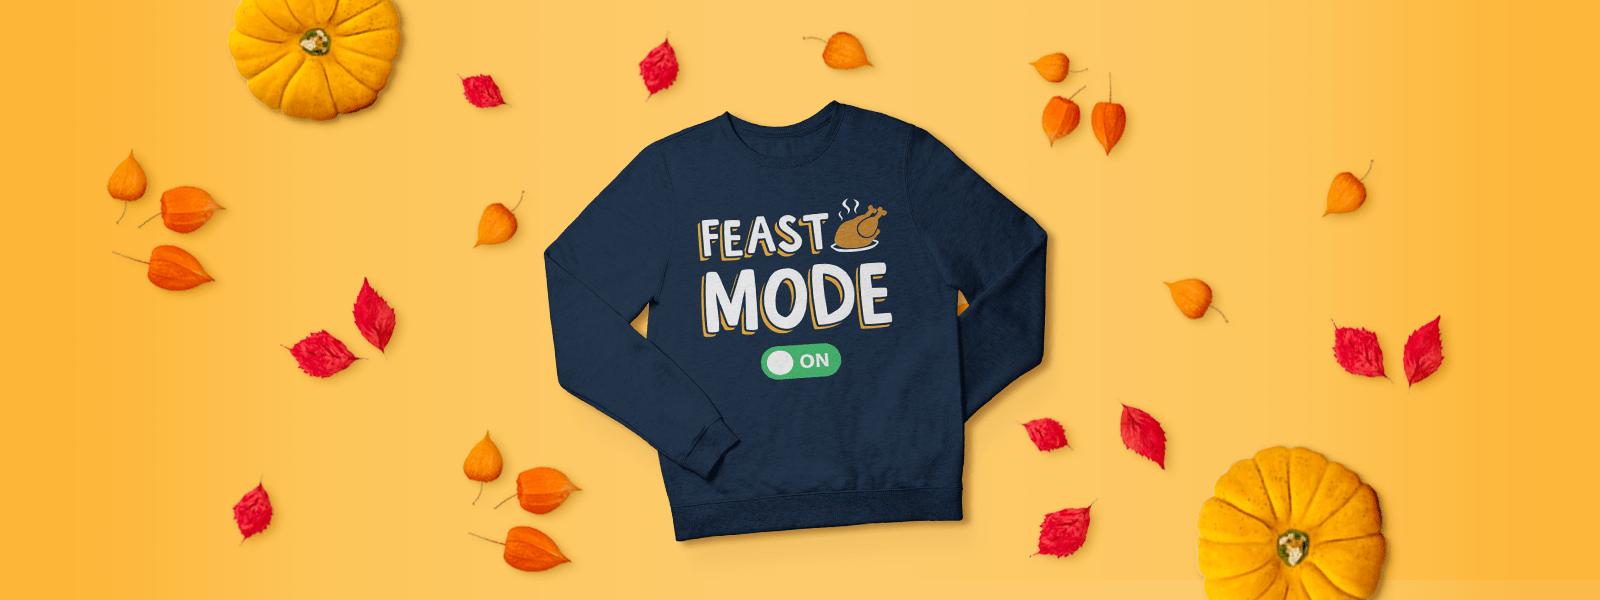 Top 5 Thanksgiving Shirt Designs